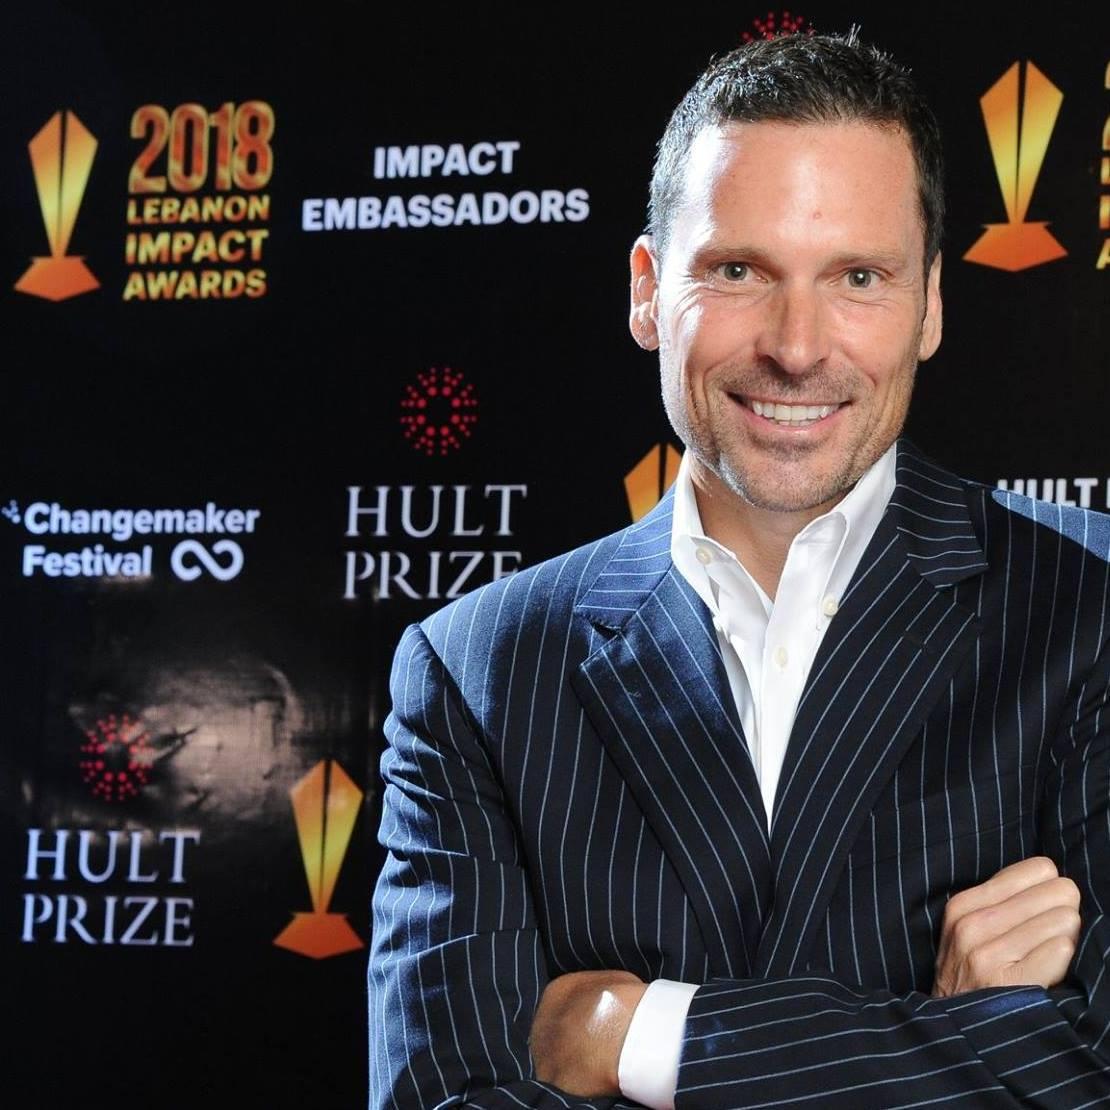 Eric Harr, Co-Founder & CEO